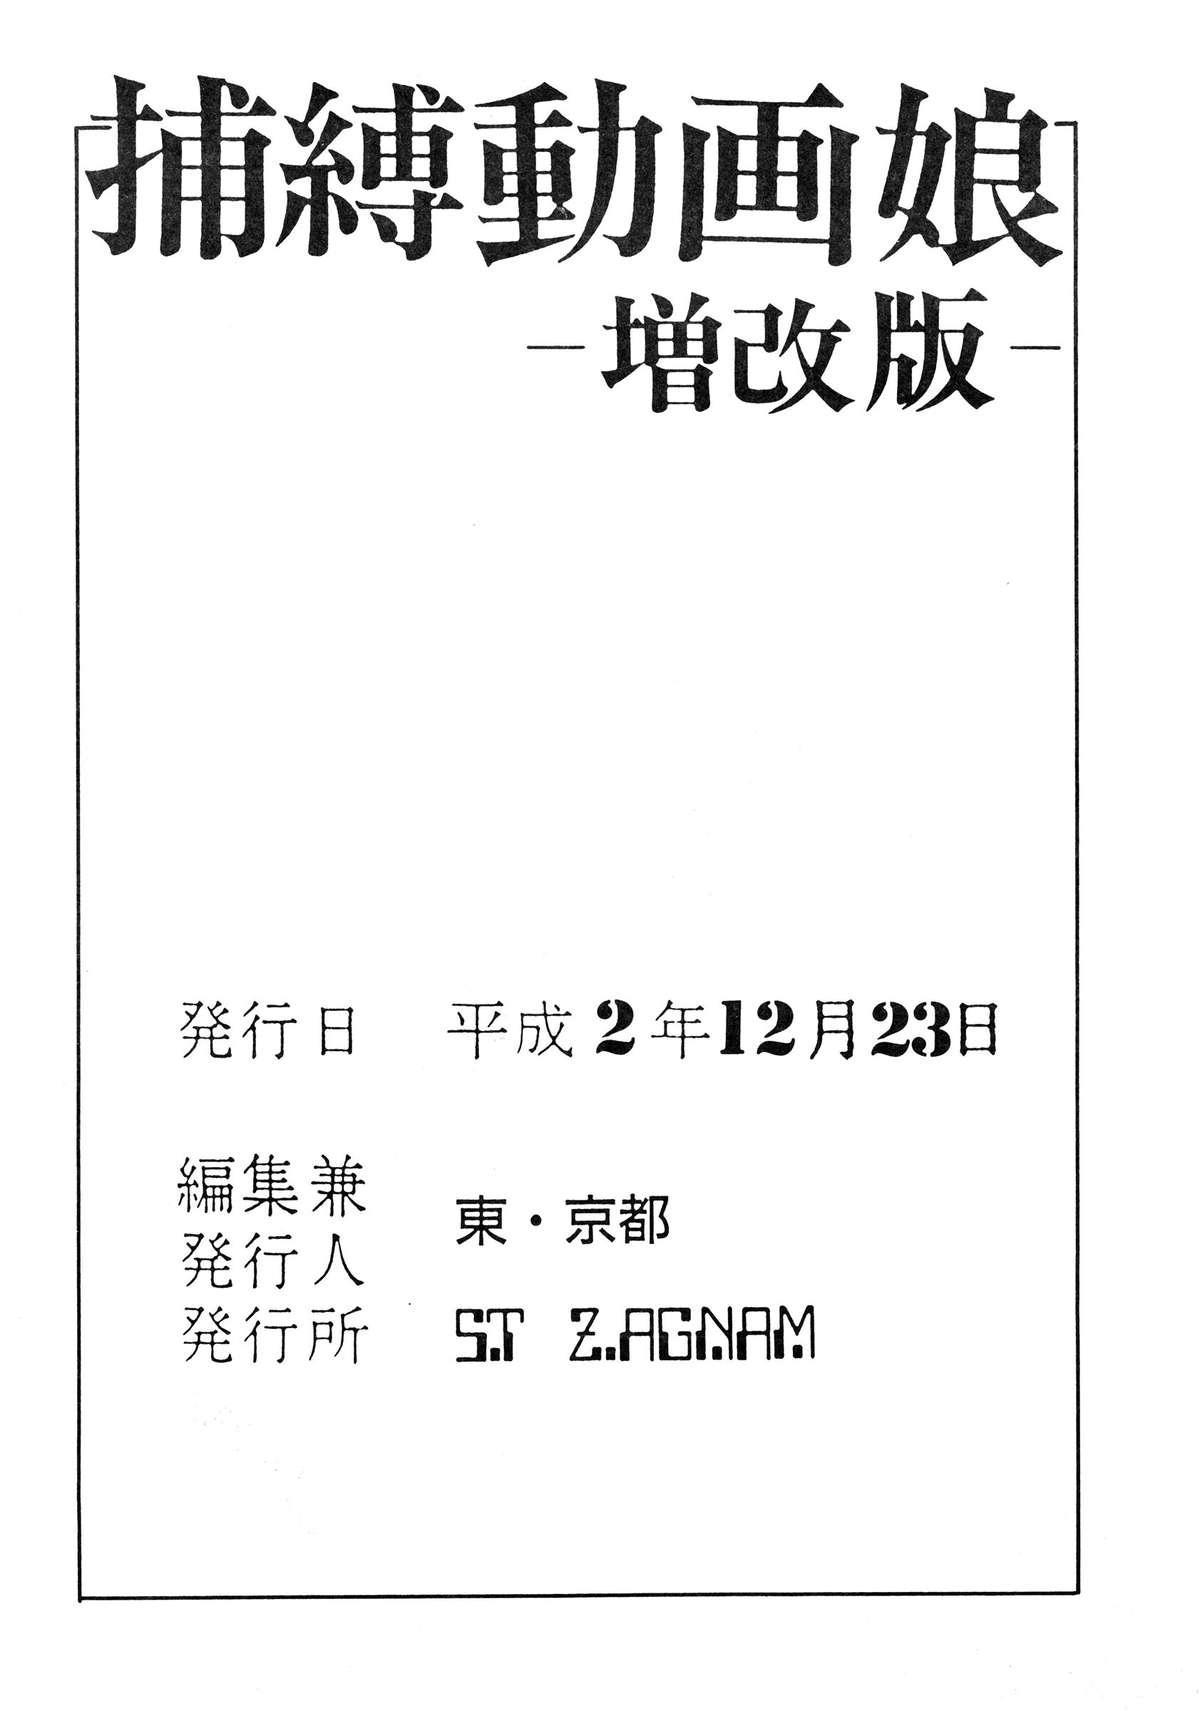 Hobaku Douga Musume - Zouho Kaiteiban 65